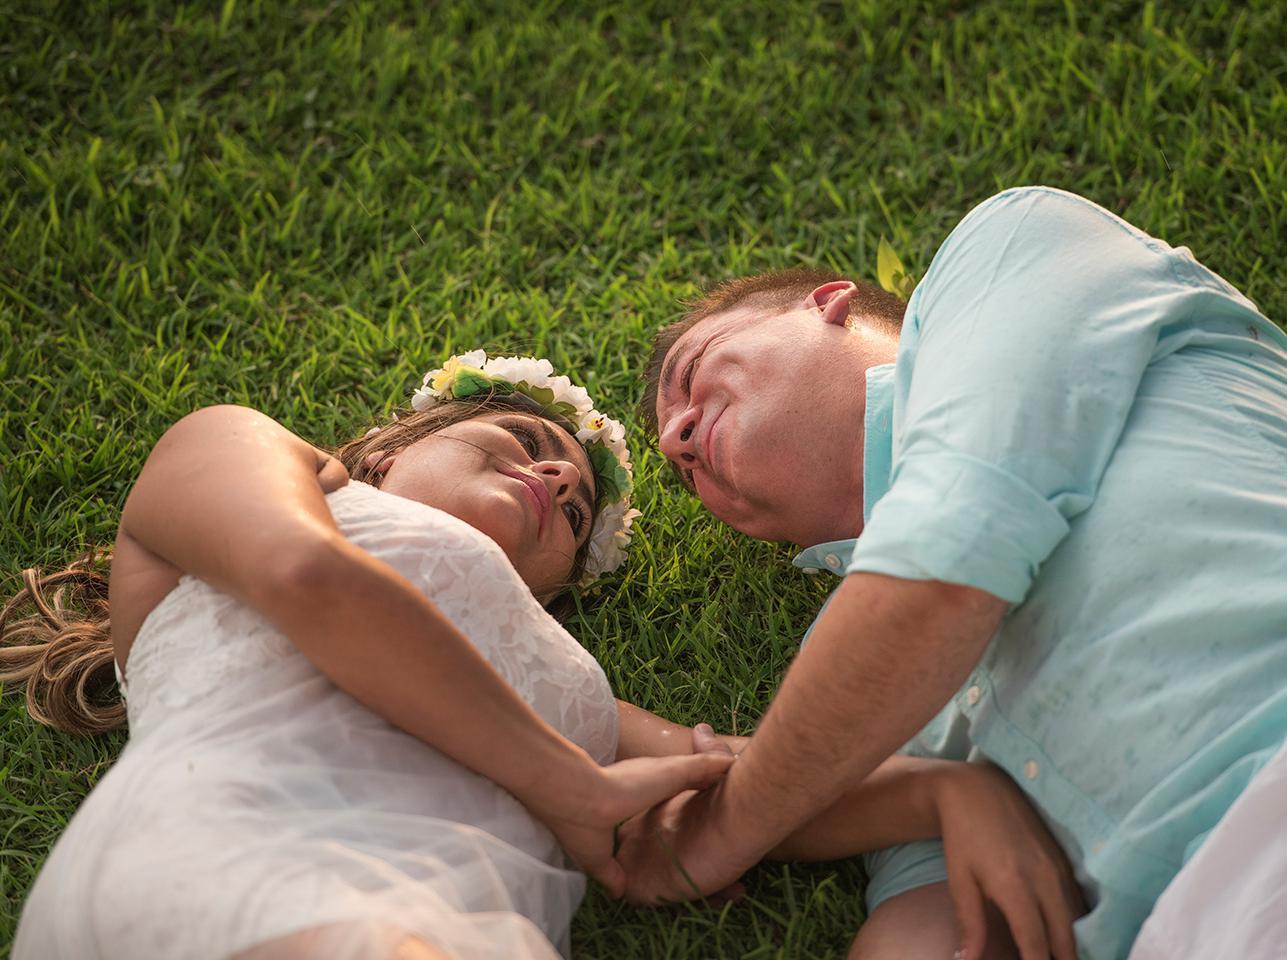 bodas-sin-clasificar-sin-tema-cuba-33602.jpg